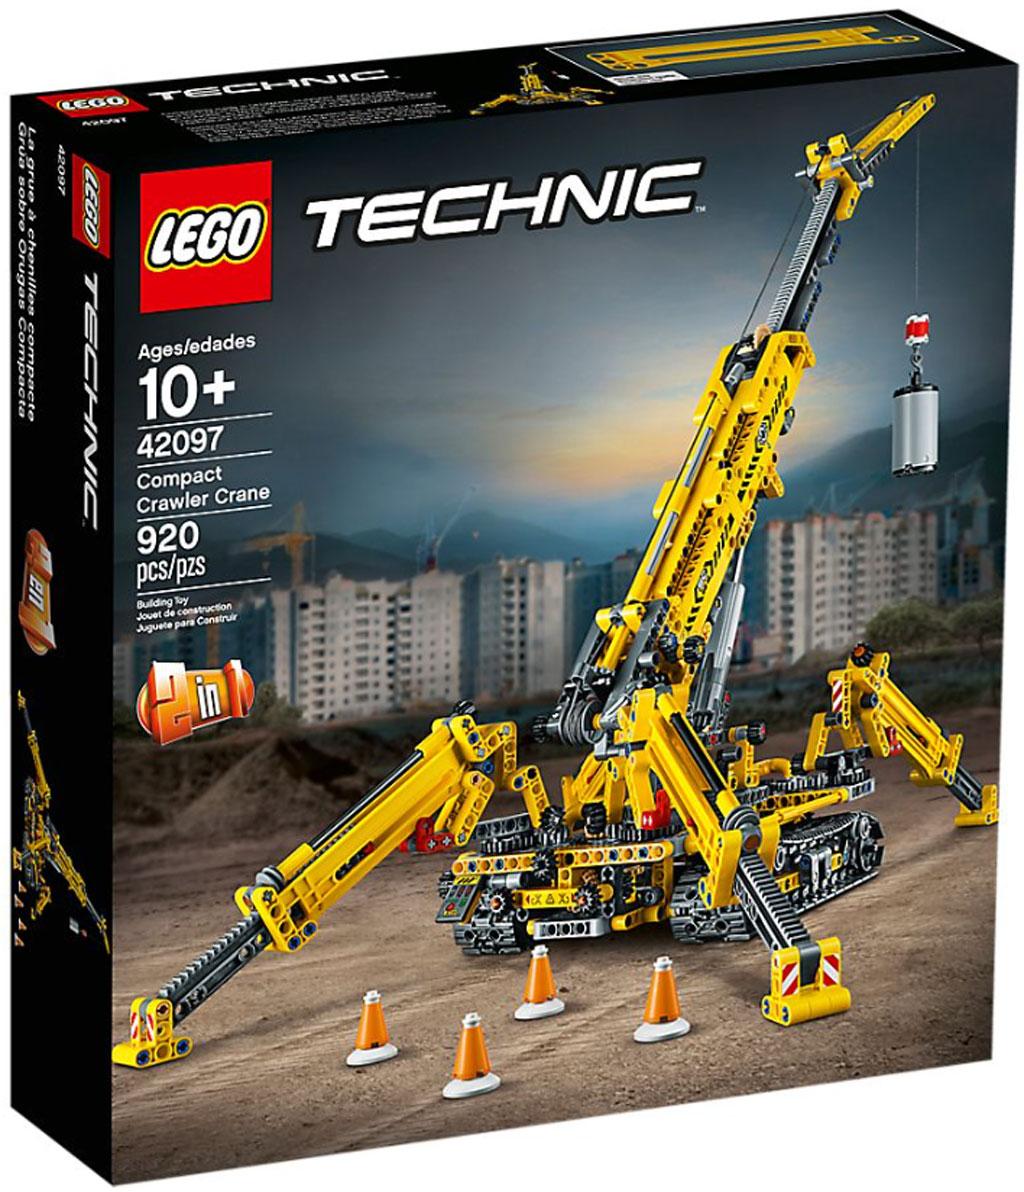 lego-technic-spinnen-kran-42097-box-2019 zusammengebaut.com